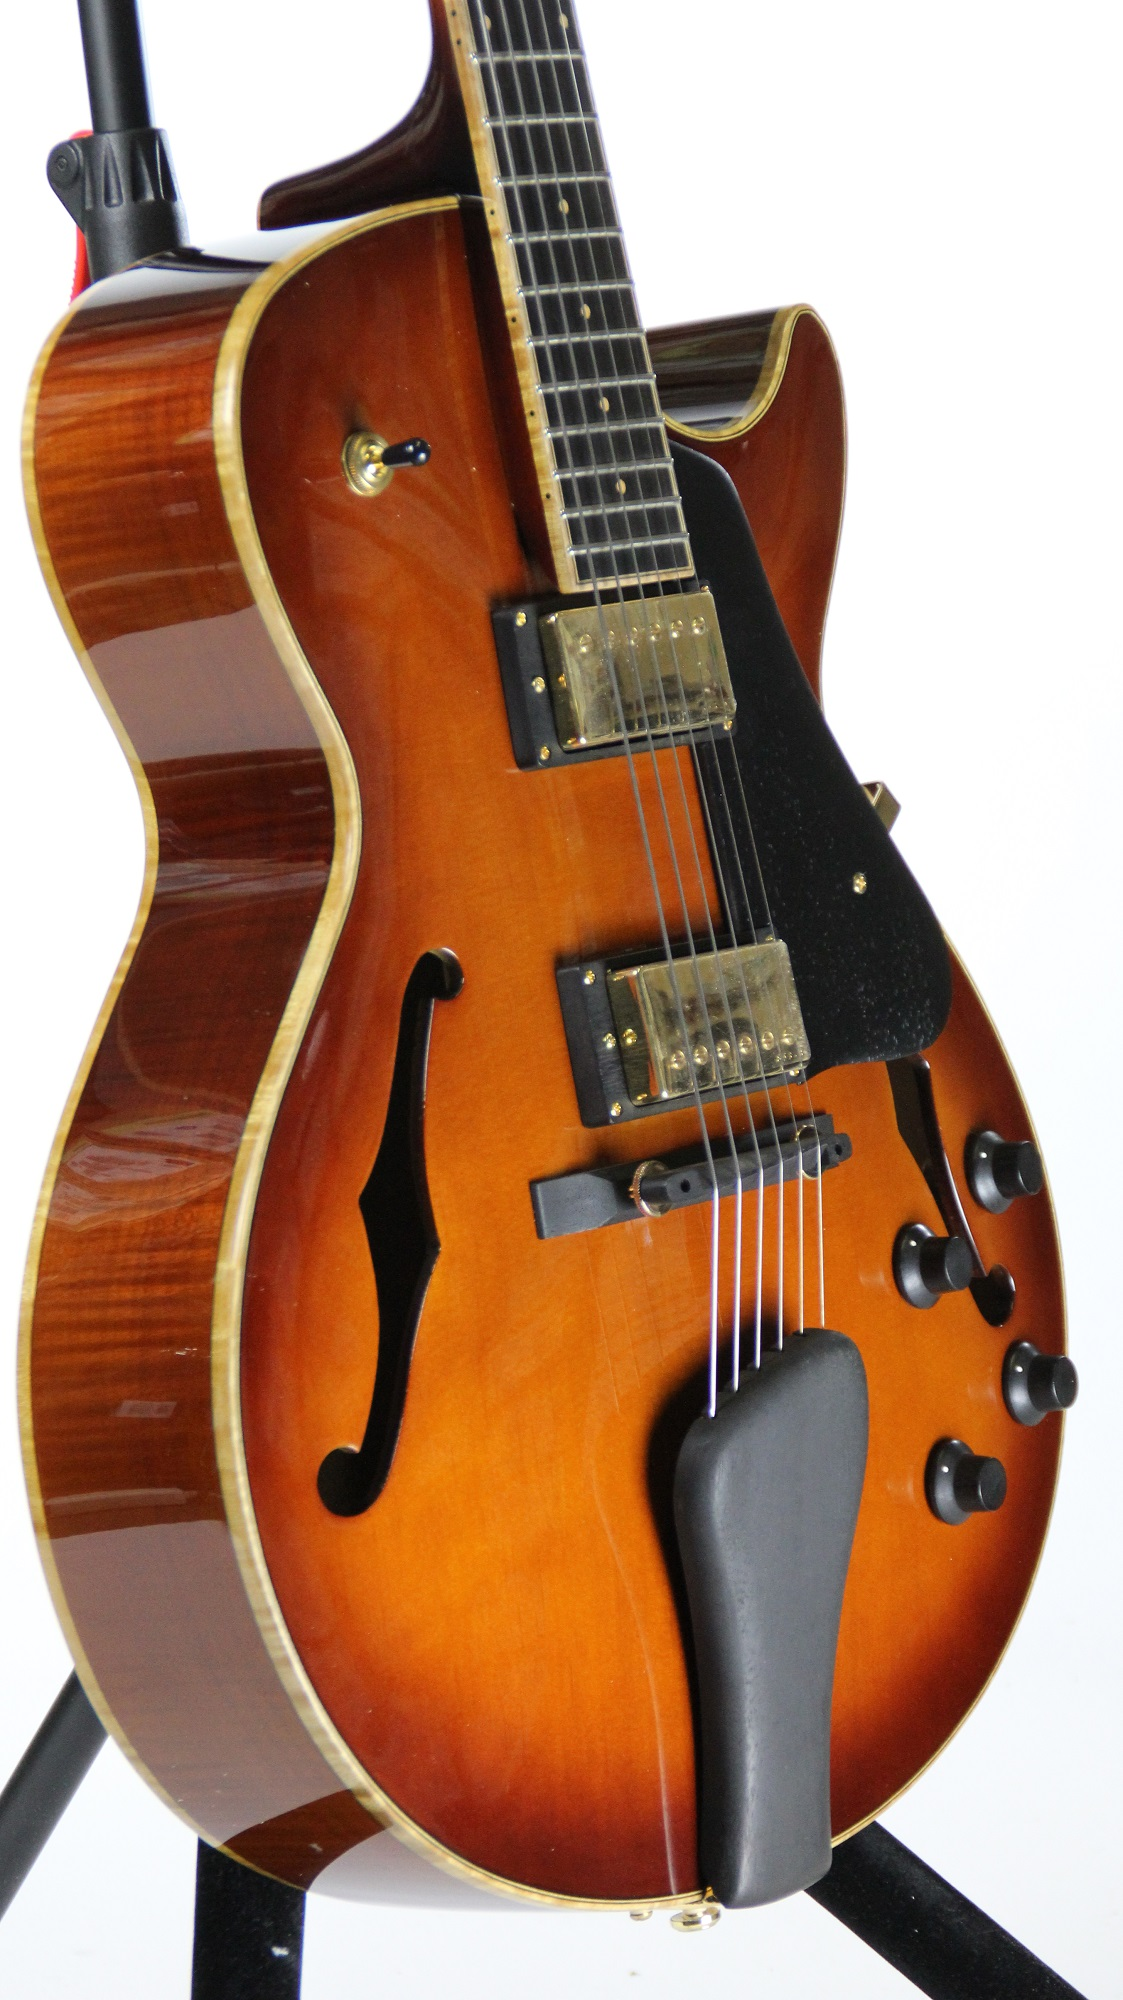 ibanez ss ss500vls full hollow body electric guitar japan market limited rare ebay. Black Bedroom Furniture Sets. Home Design Ideas